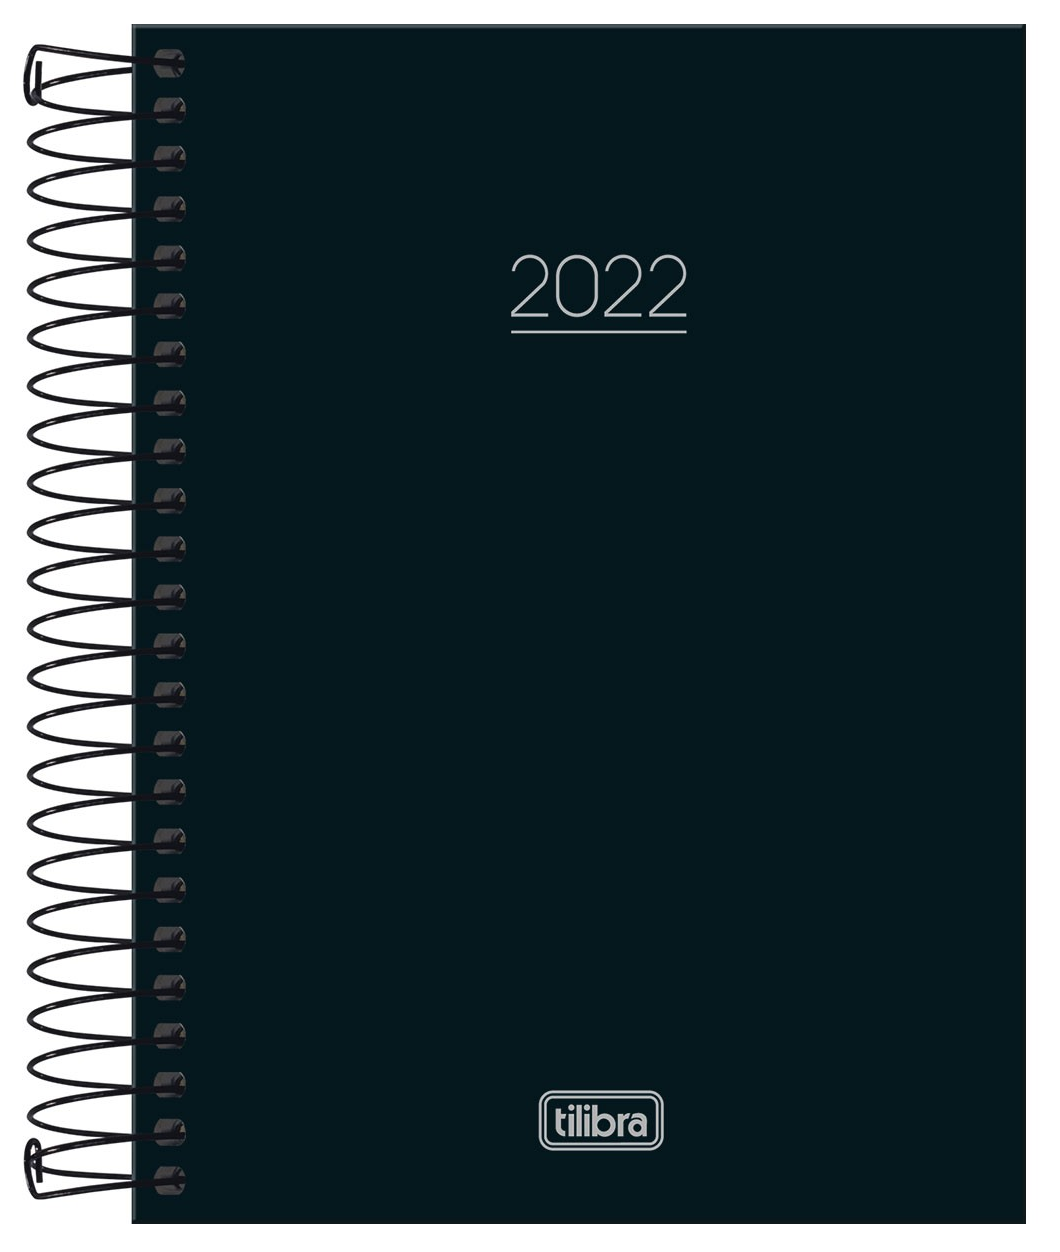 Agenda Espiral Diária Pepper Preto M4 2022 - Tilibra